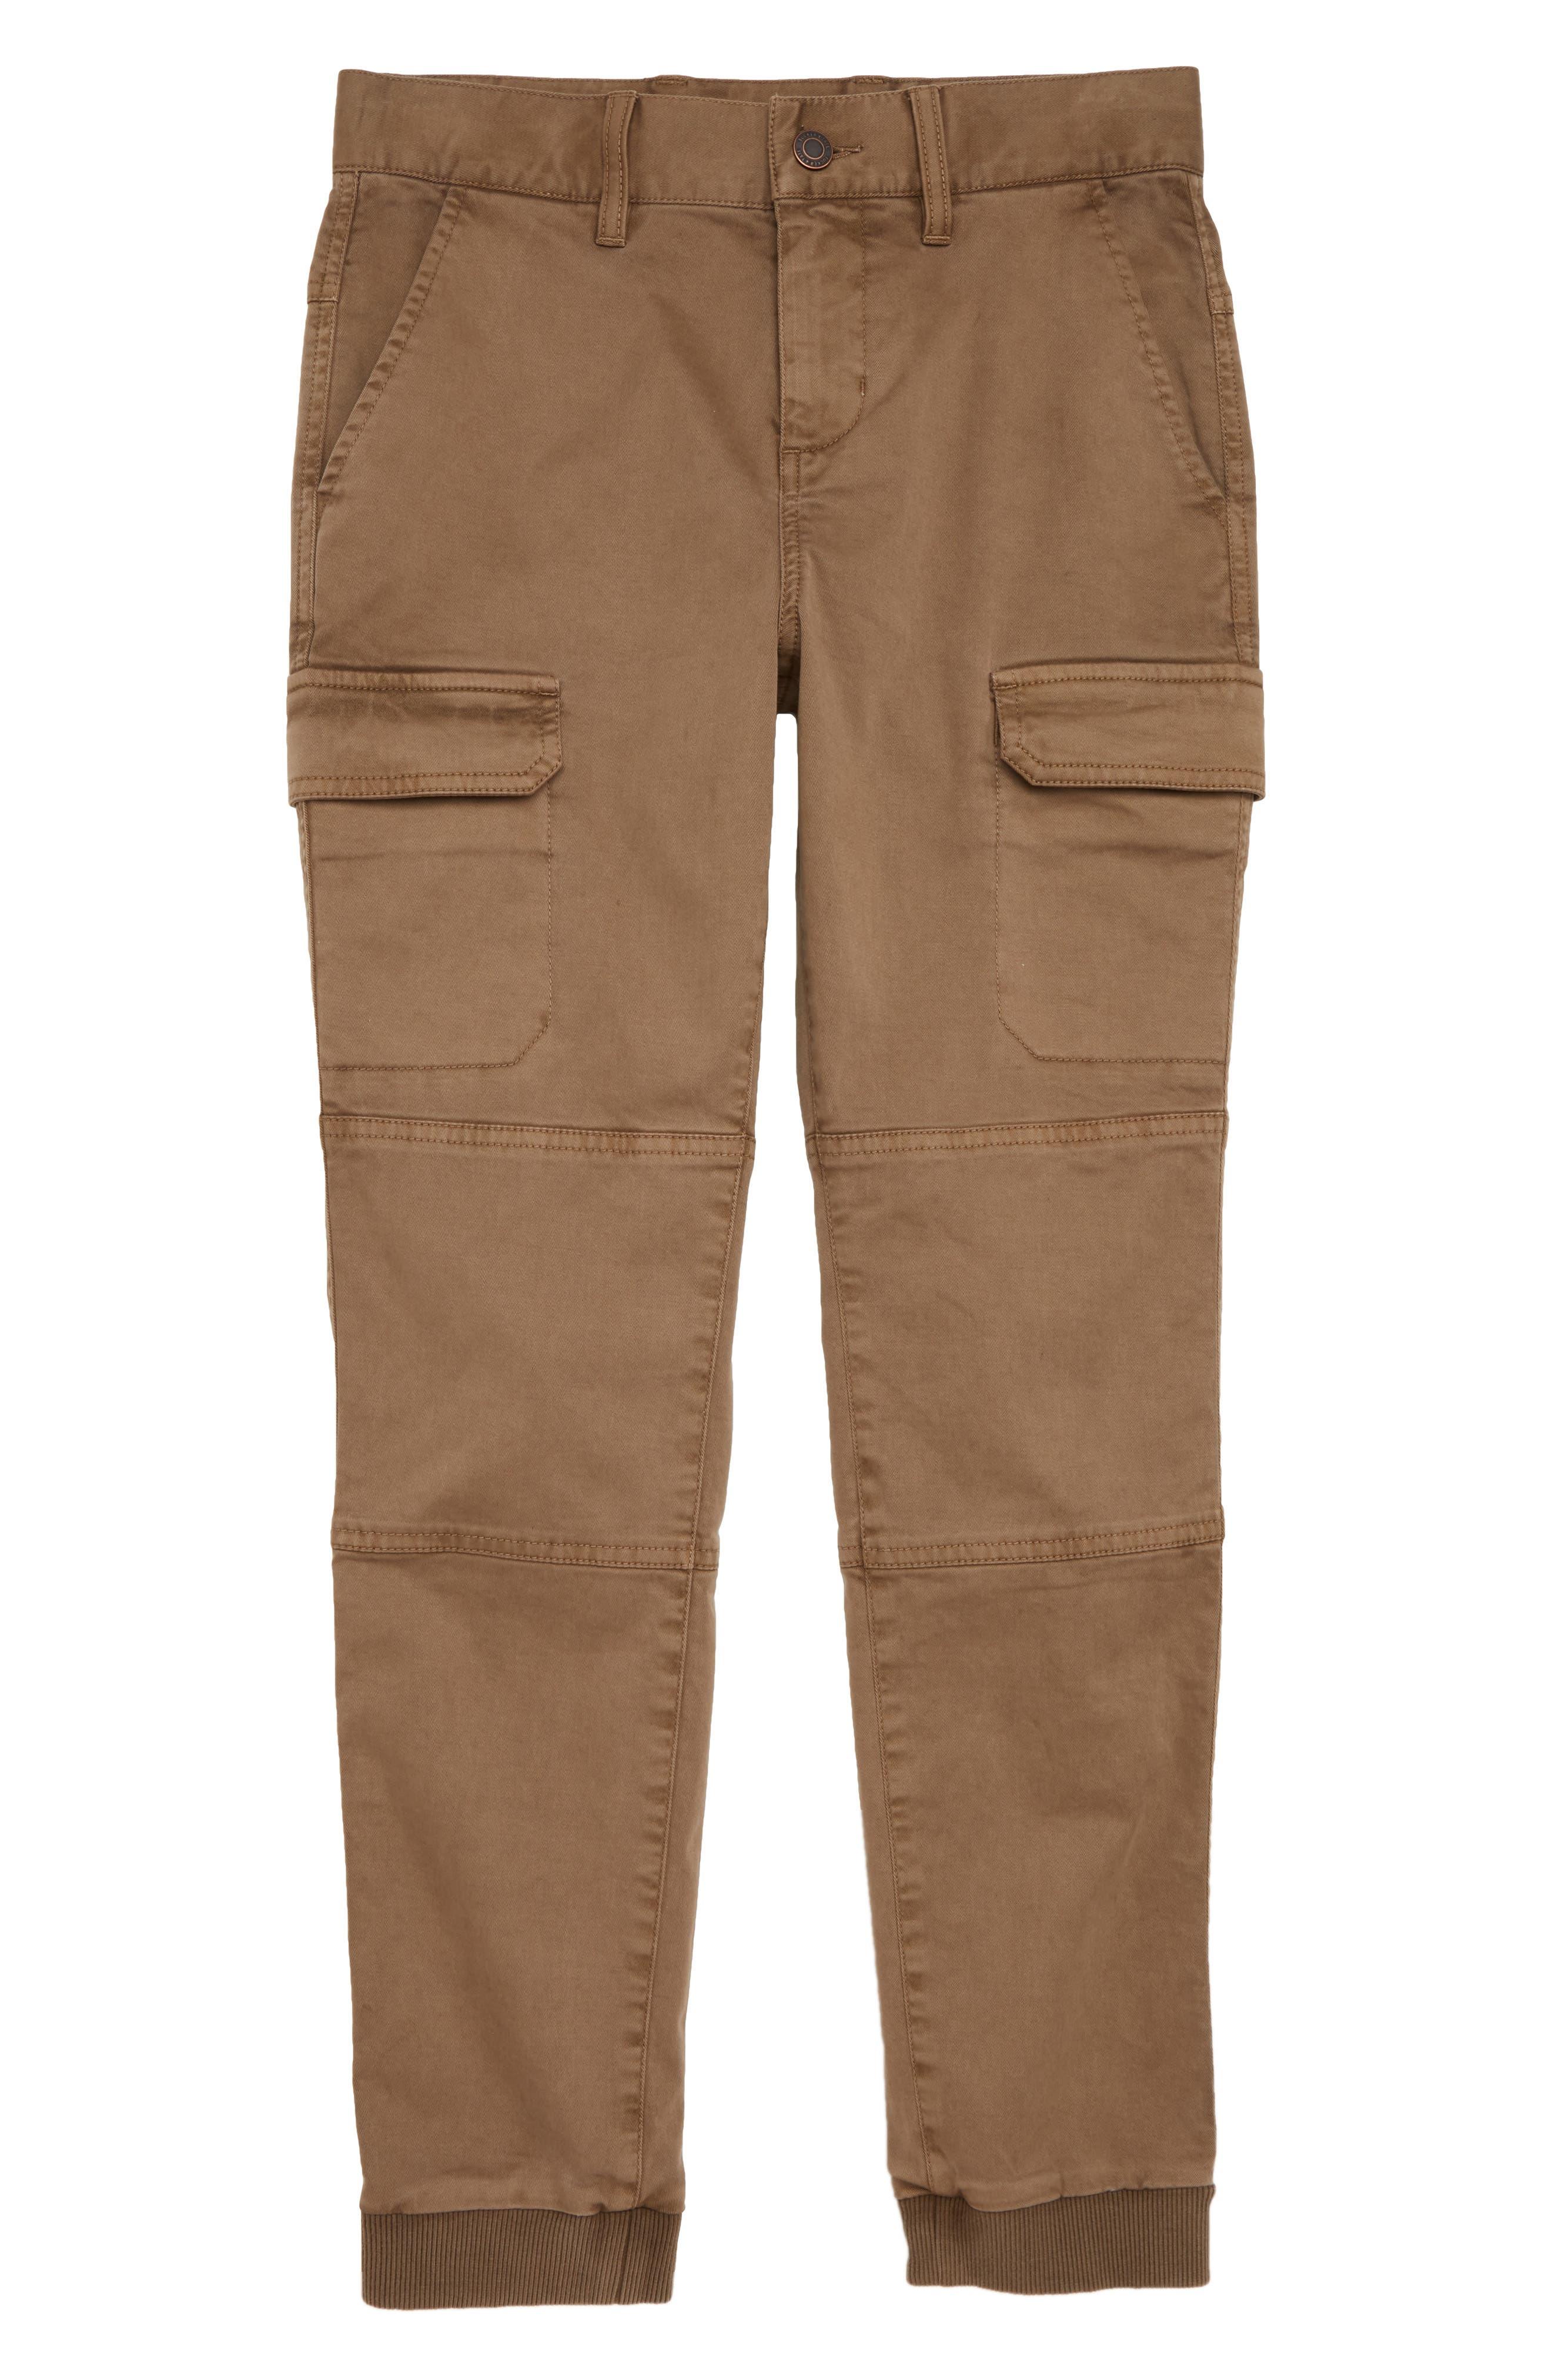 Cargo Jogger Pants,                         Main,                         color, BROWN CUB